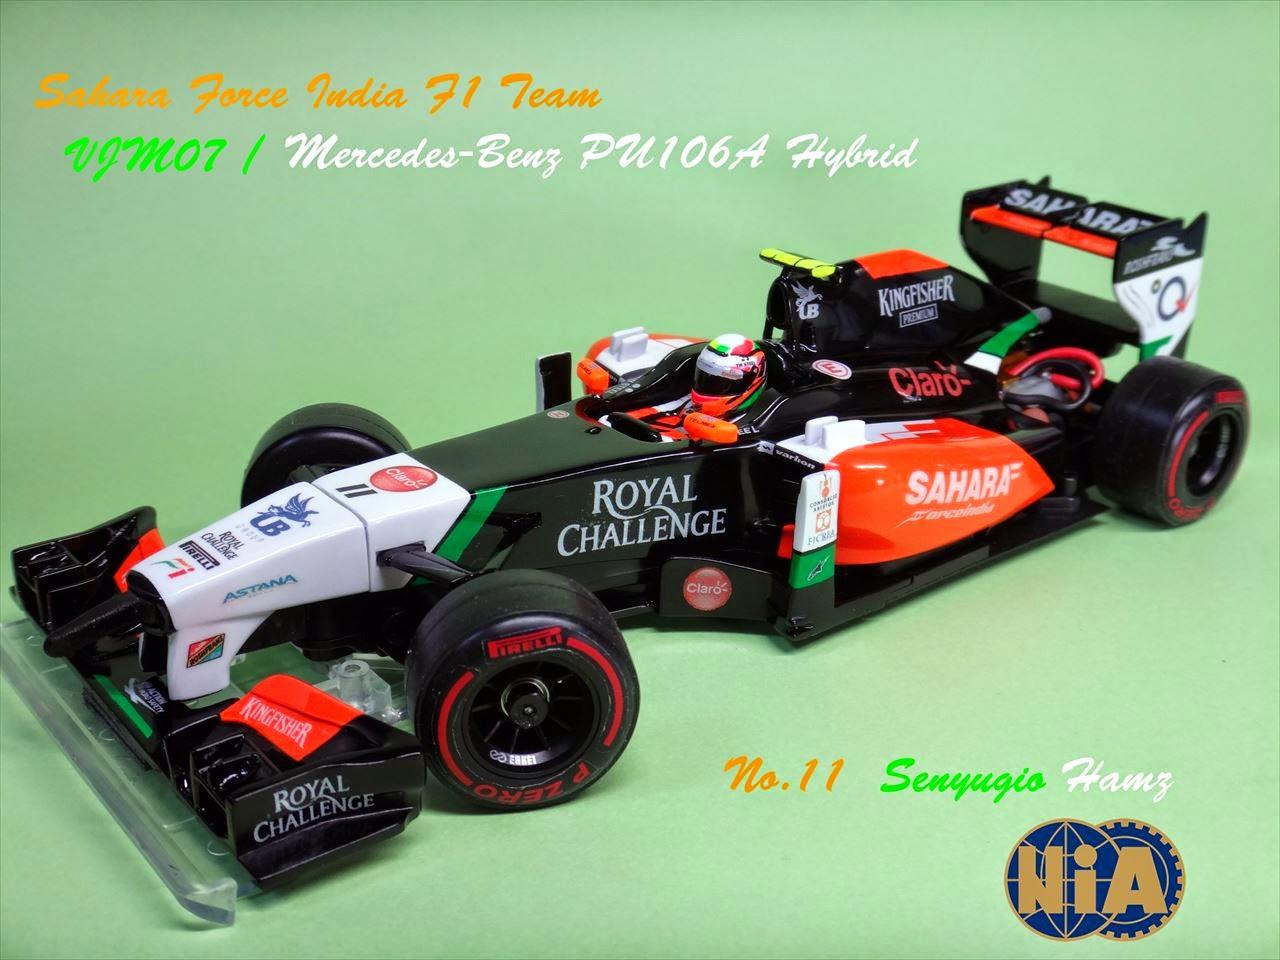 Kyoshosan Nia Custom Mini Z F1 Force India 2014 Pn Racing V2 Rc Printed Circuit Board Assembly Mr03 Setting